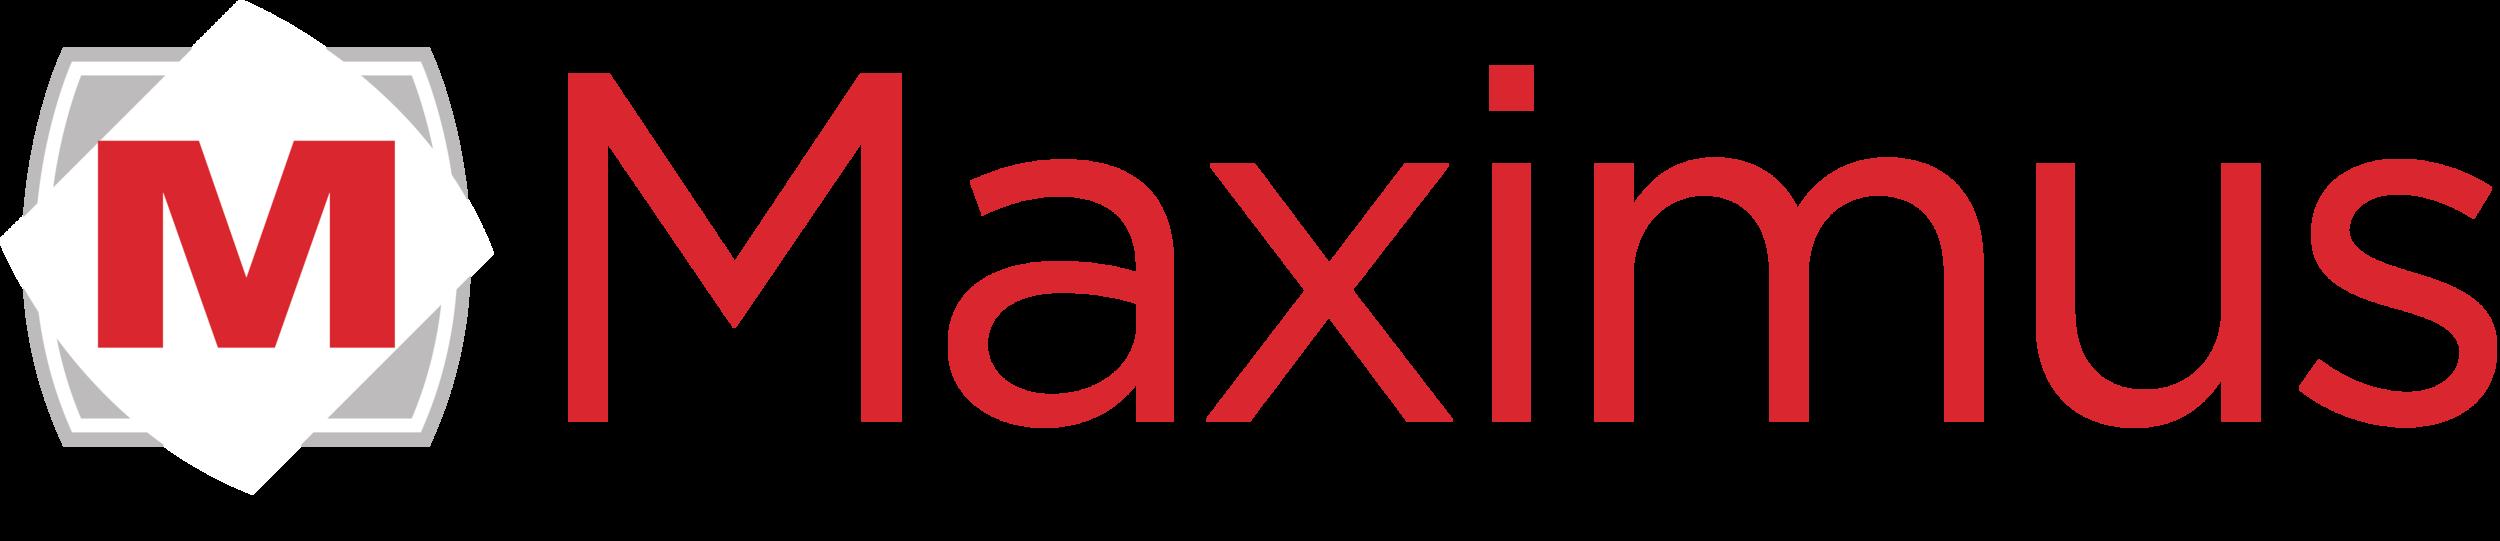 New_Maximus-logo.png